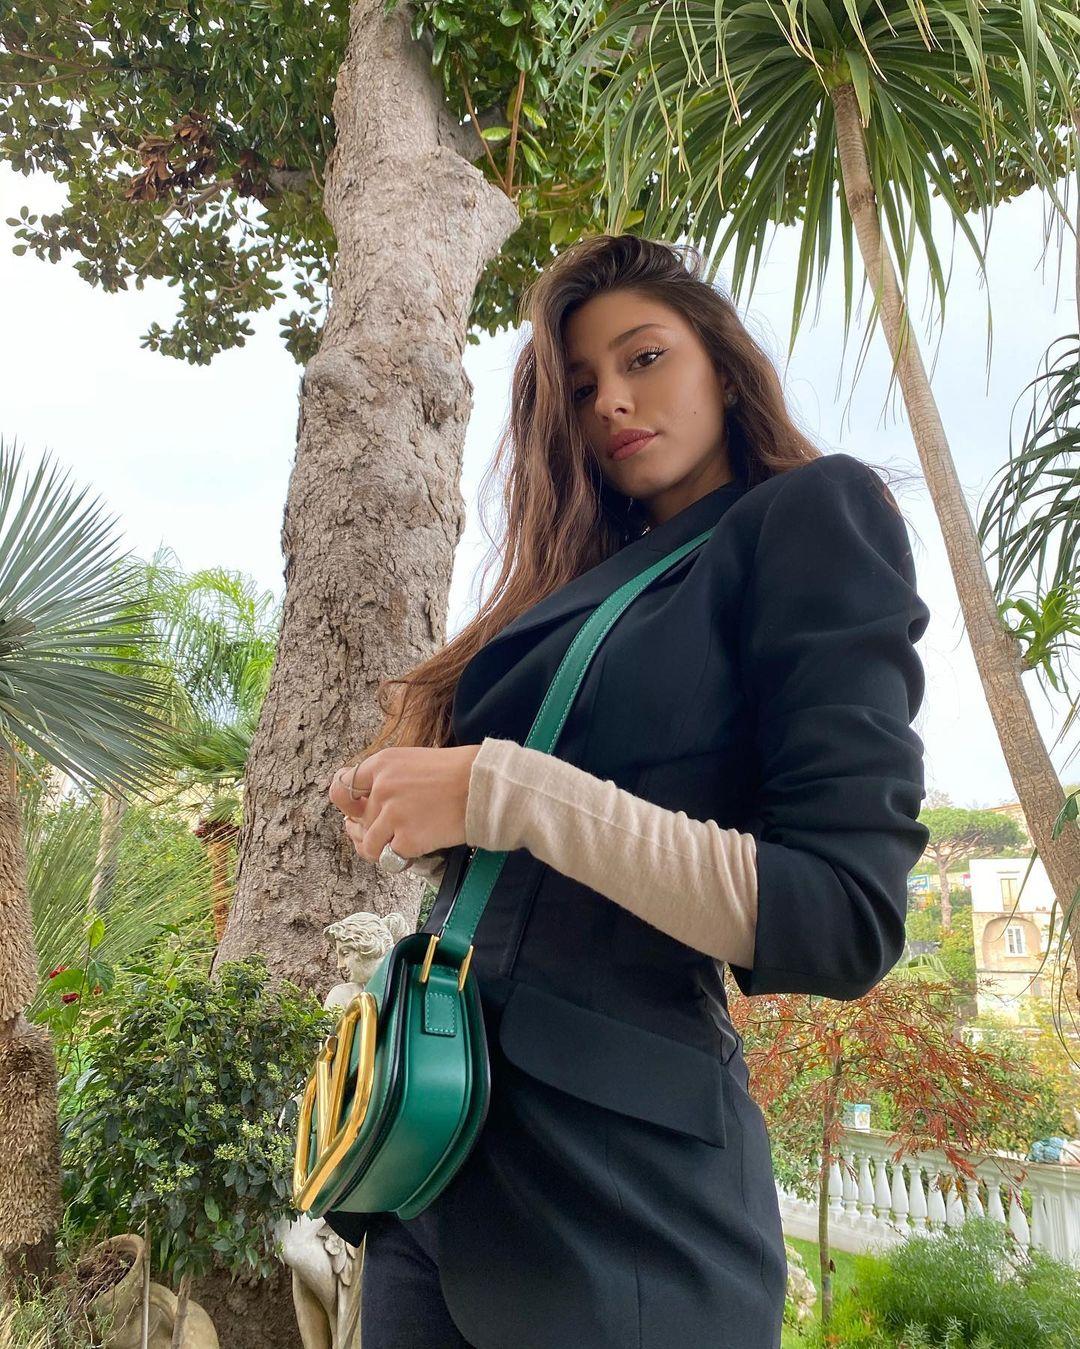 Angela-Nasti-Wallpapers-Insta-Fit-Bio-9